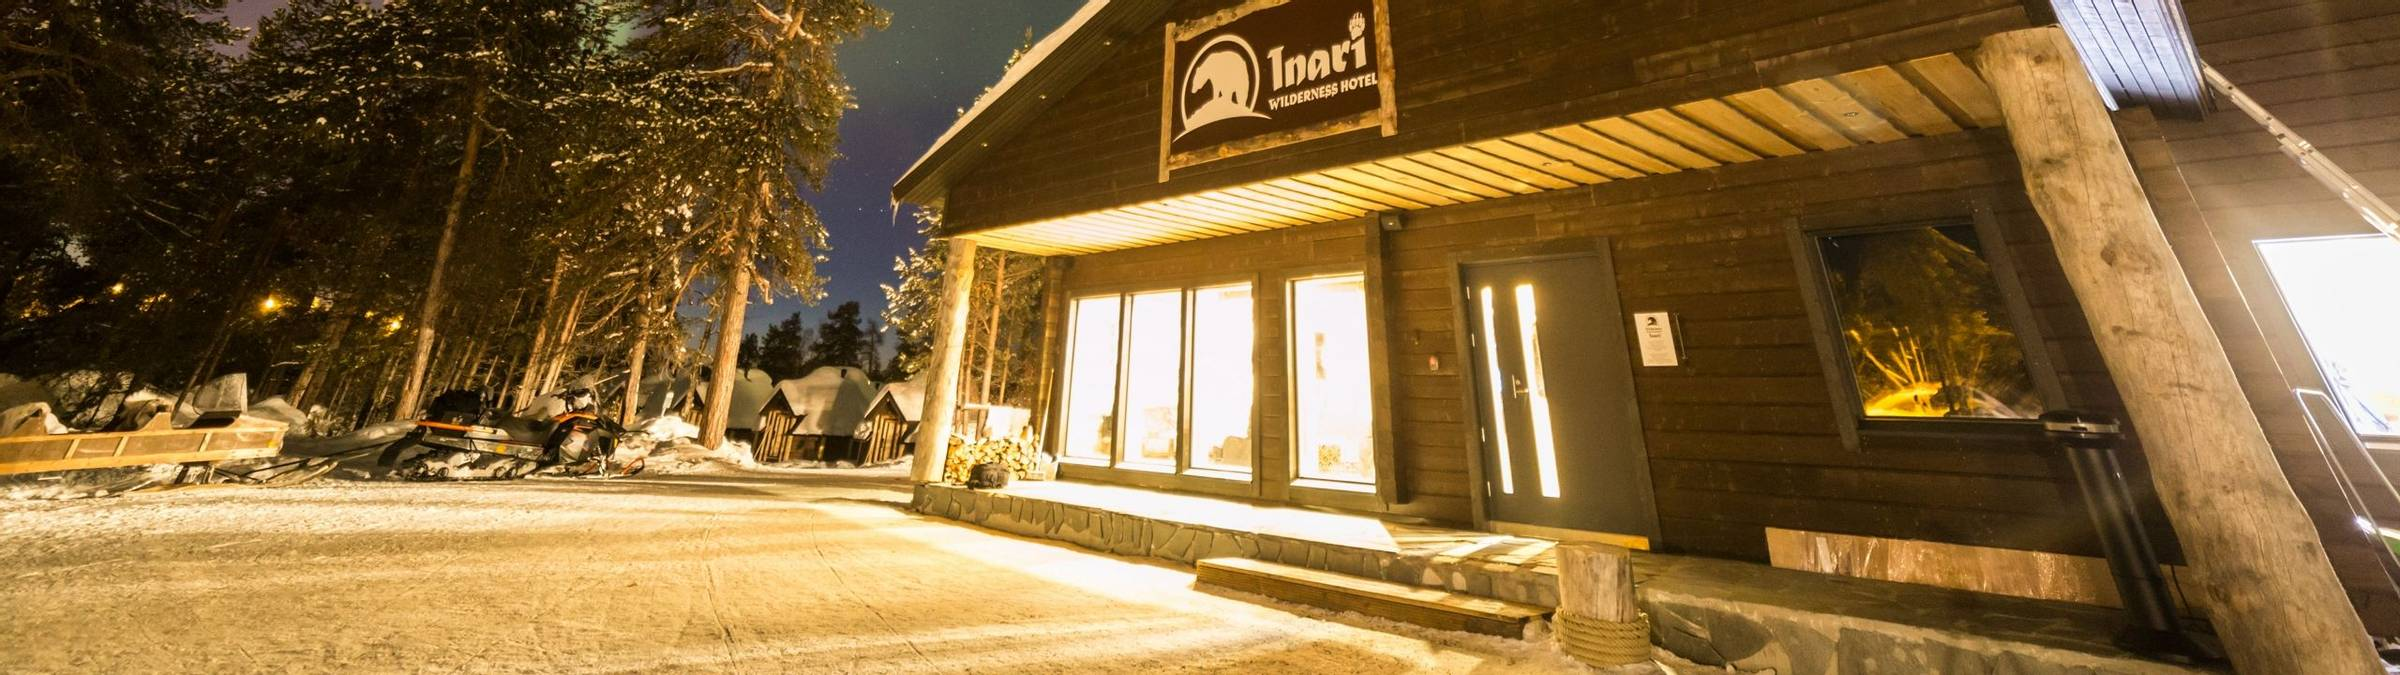 IMG 2902   Inari   Credit Matt Robinson